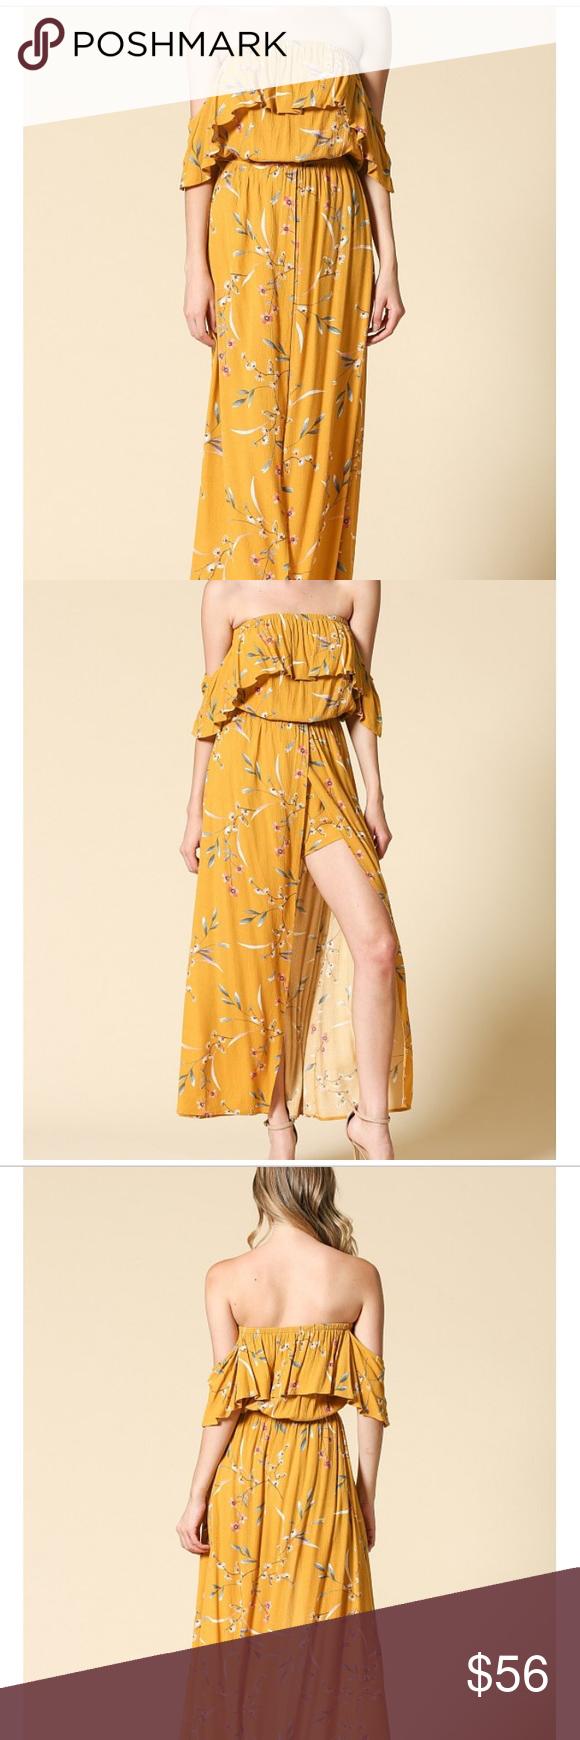 Ildlmustard floral maxi dress a floral print offthe